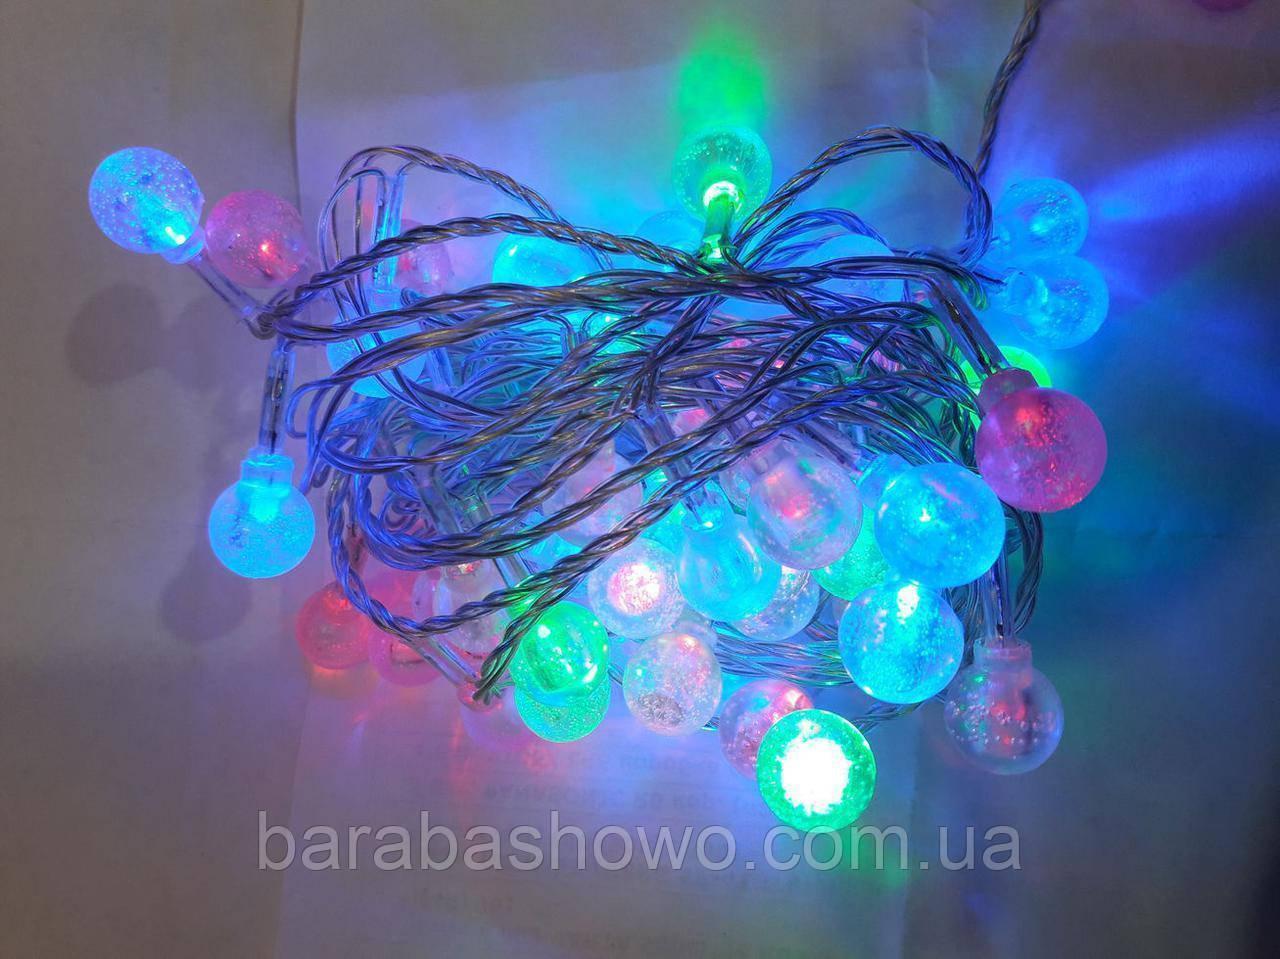 Гирлянда ФИГУРКИ (шарик прозрачный) 40 LED на черном проводе